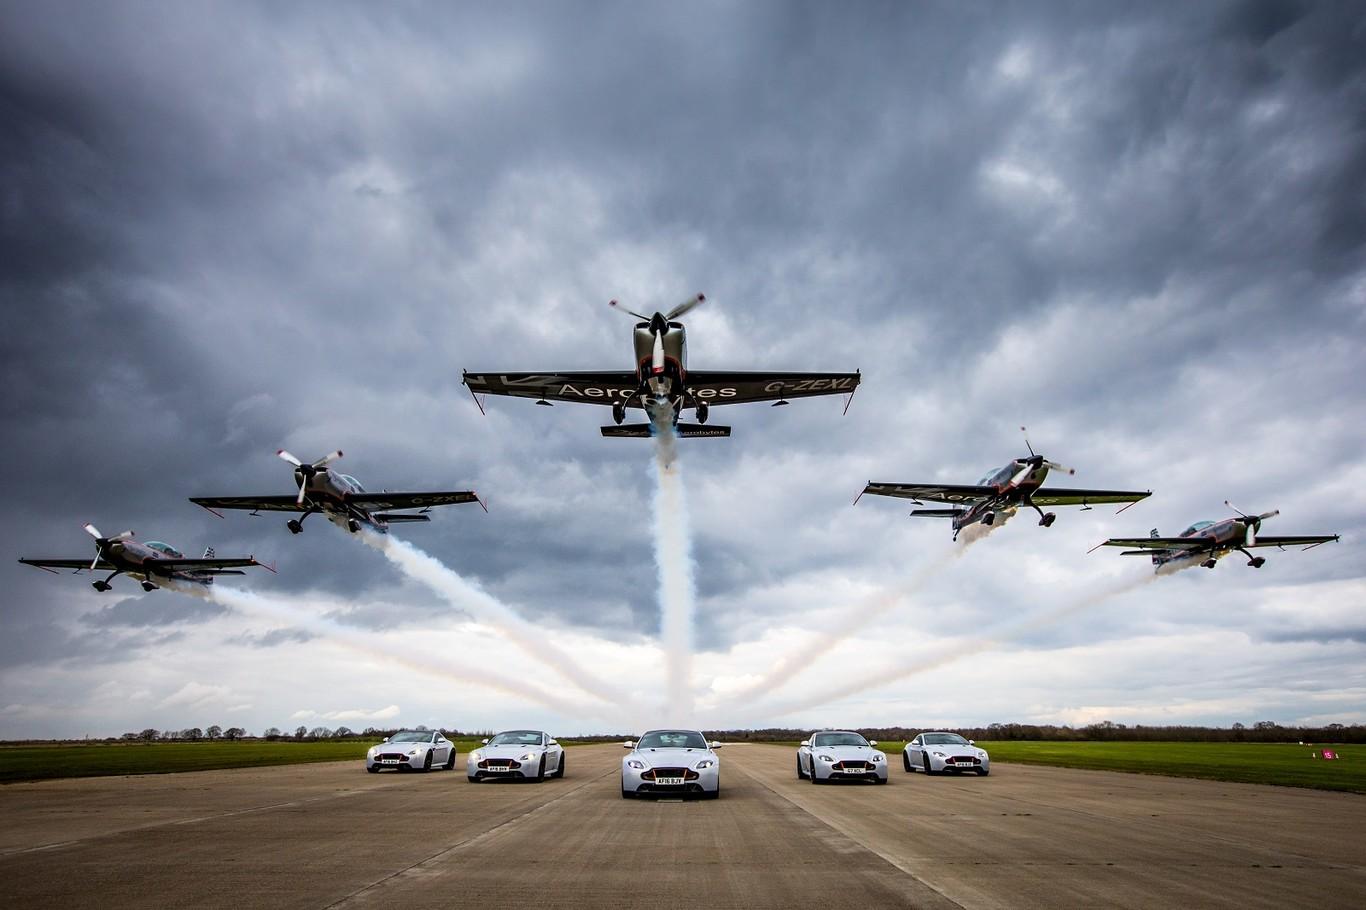 La serie Aston Martin Wings despega